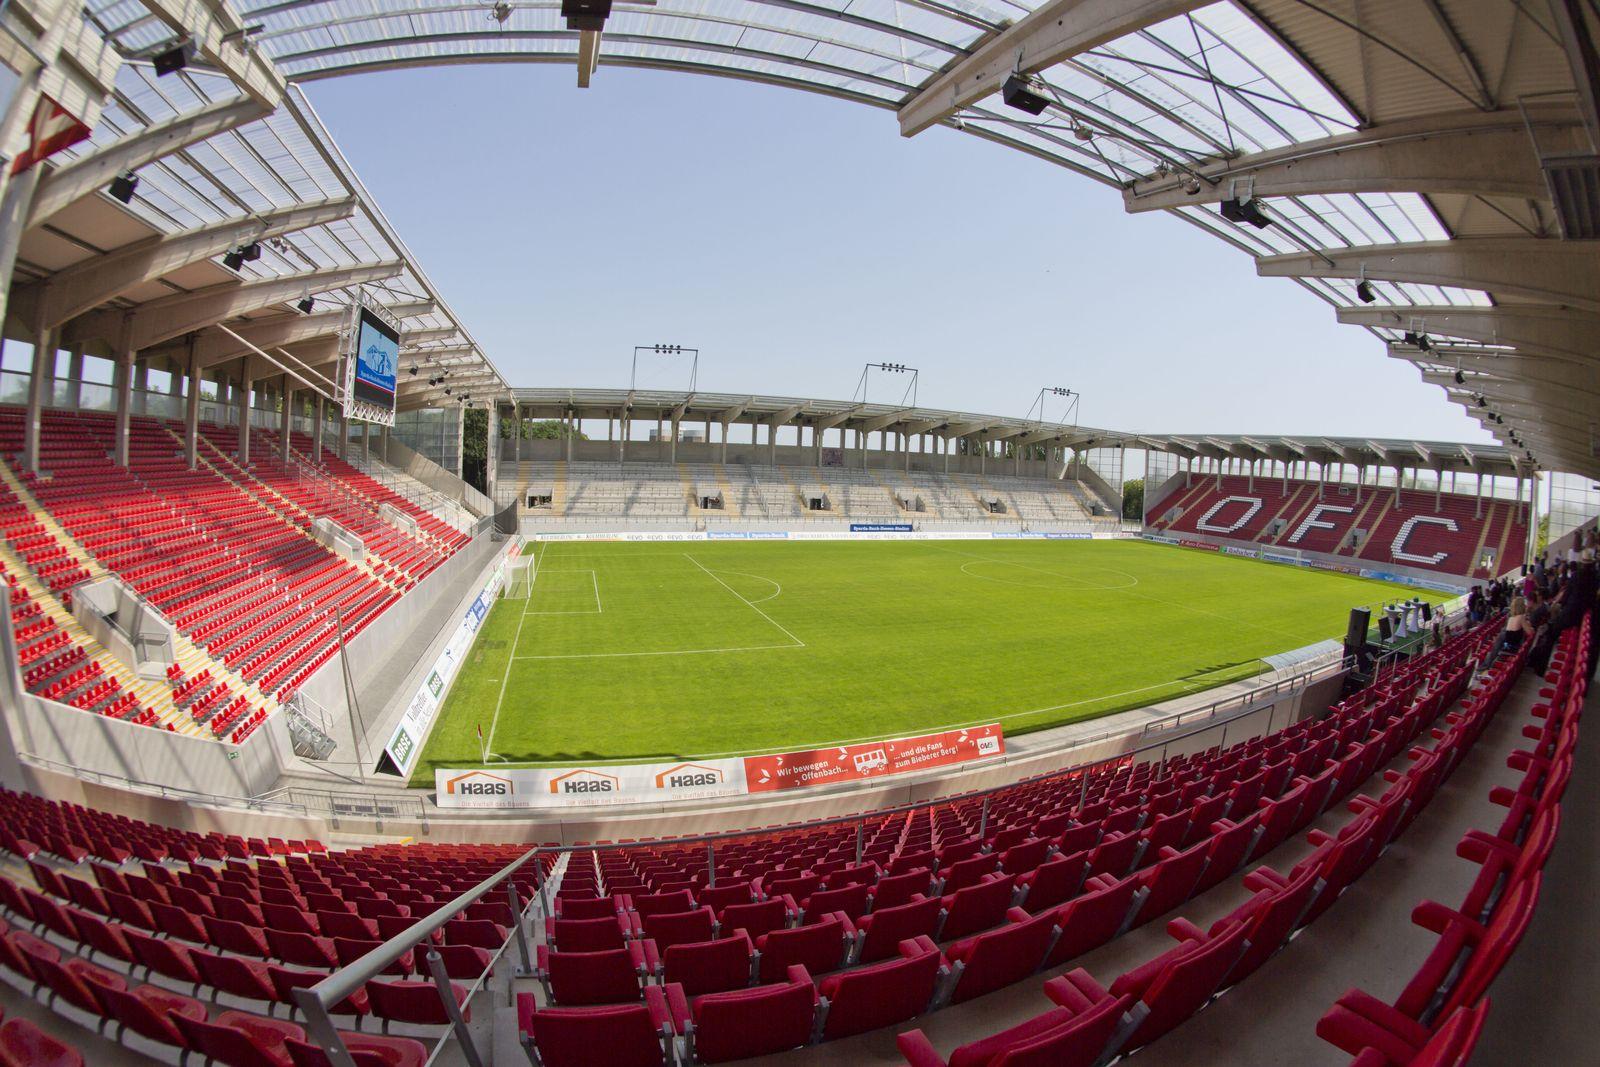 Sparda Bank Hessen Stadion/ Offenbach